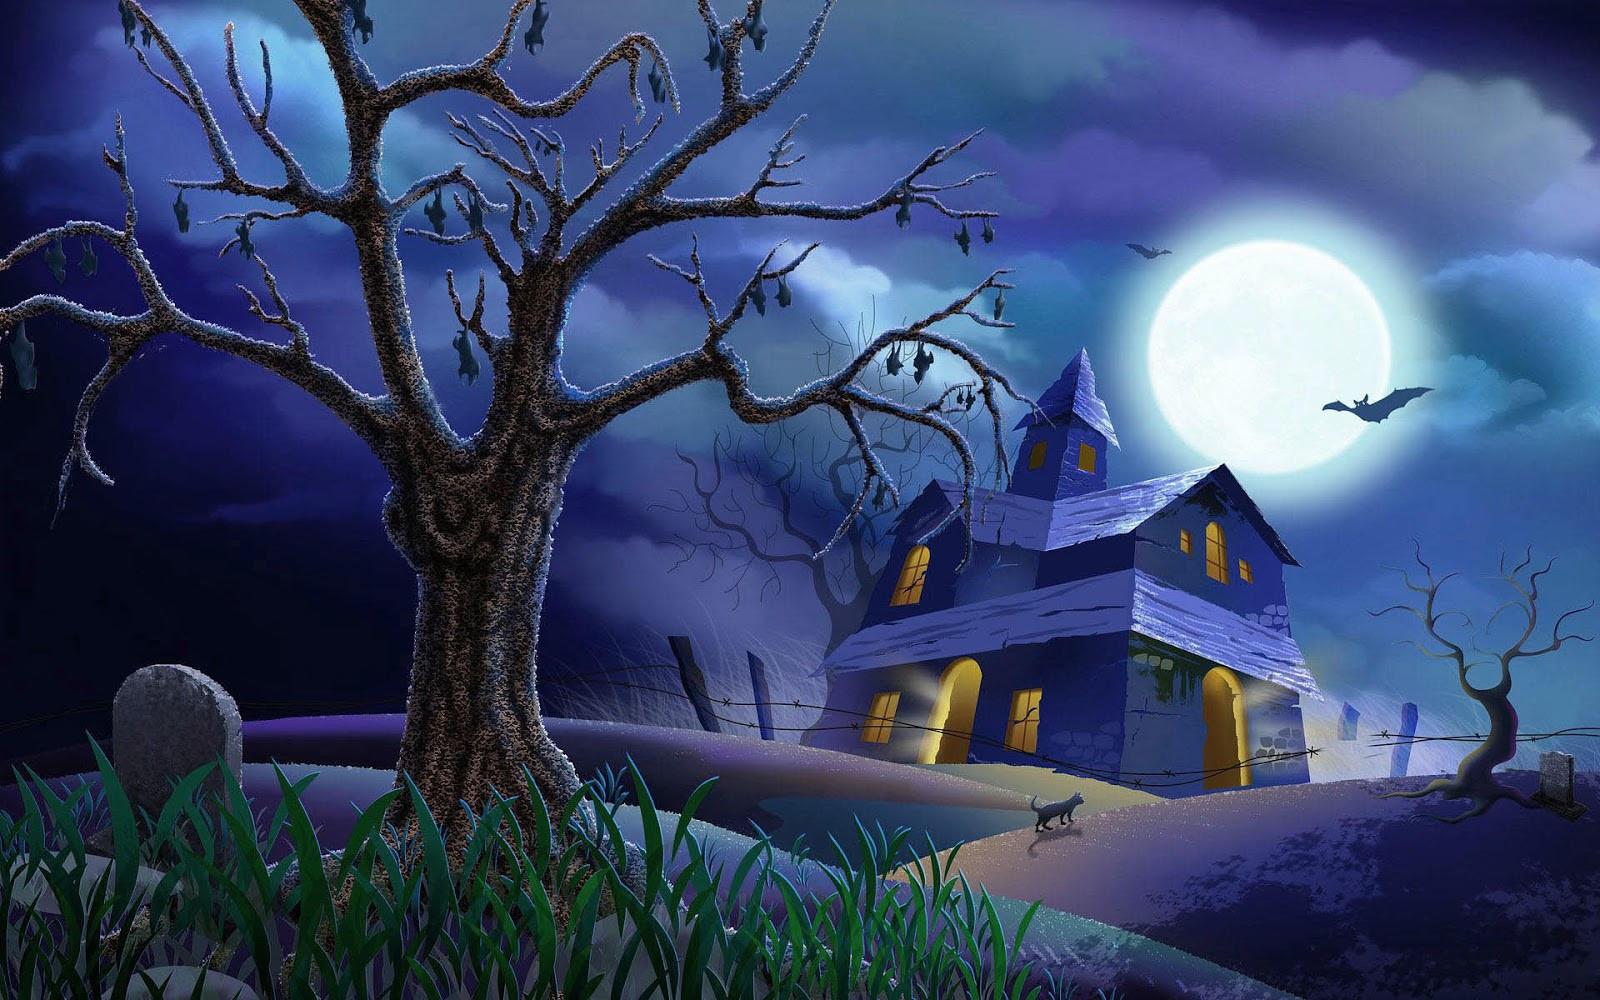 Halloween 3D Wallpaper  3D Animated Halloween Desktop Wallpaper WallpaperSafari